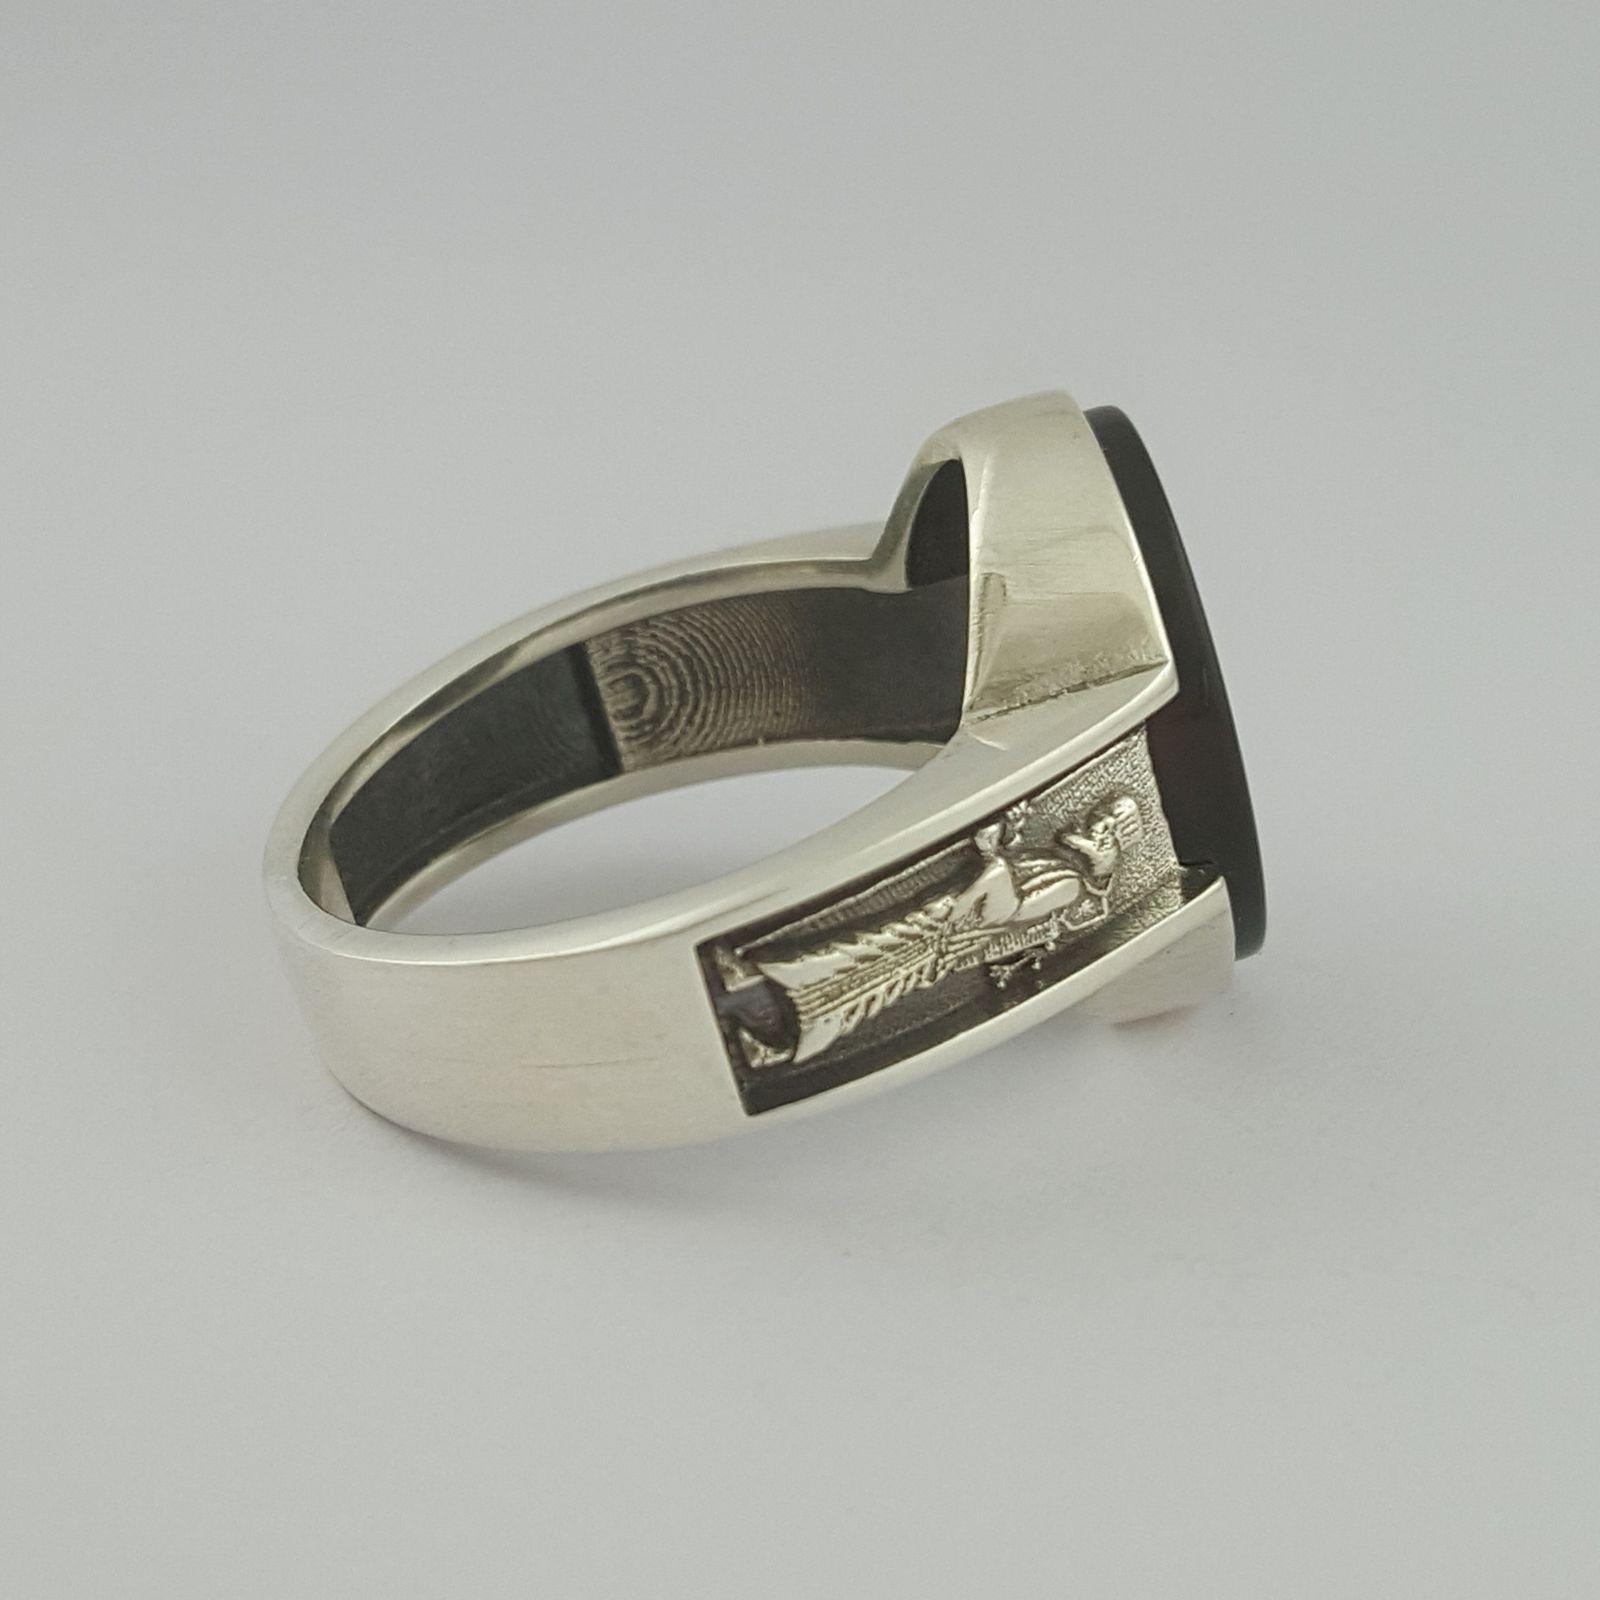 انگشتر نقره مردانه بلو استون کد 1069-65 -  - 3